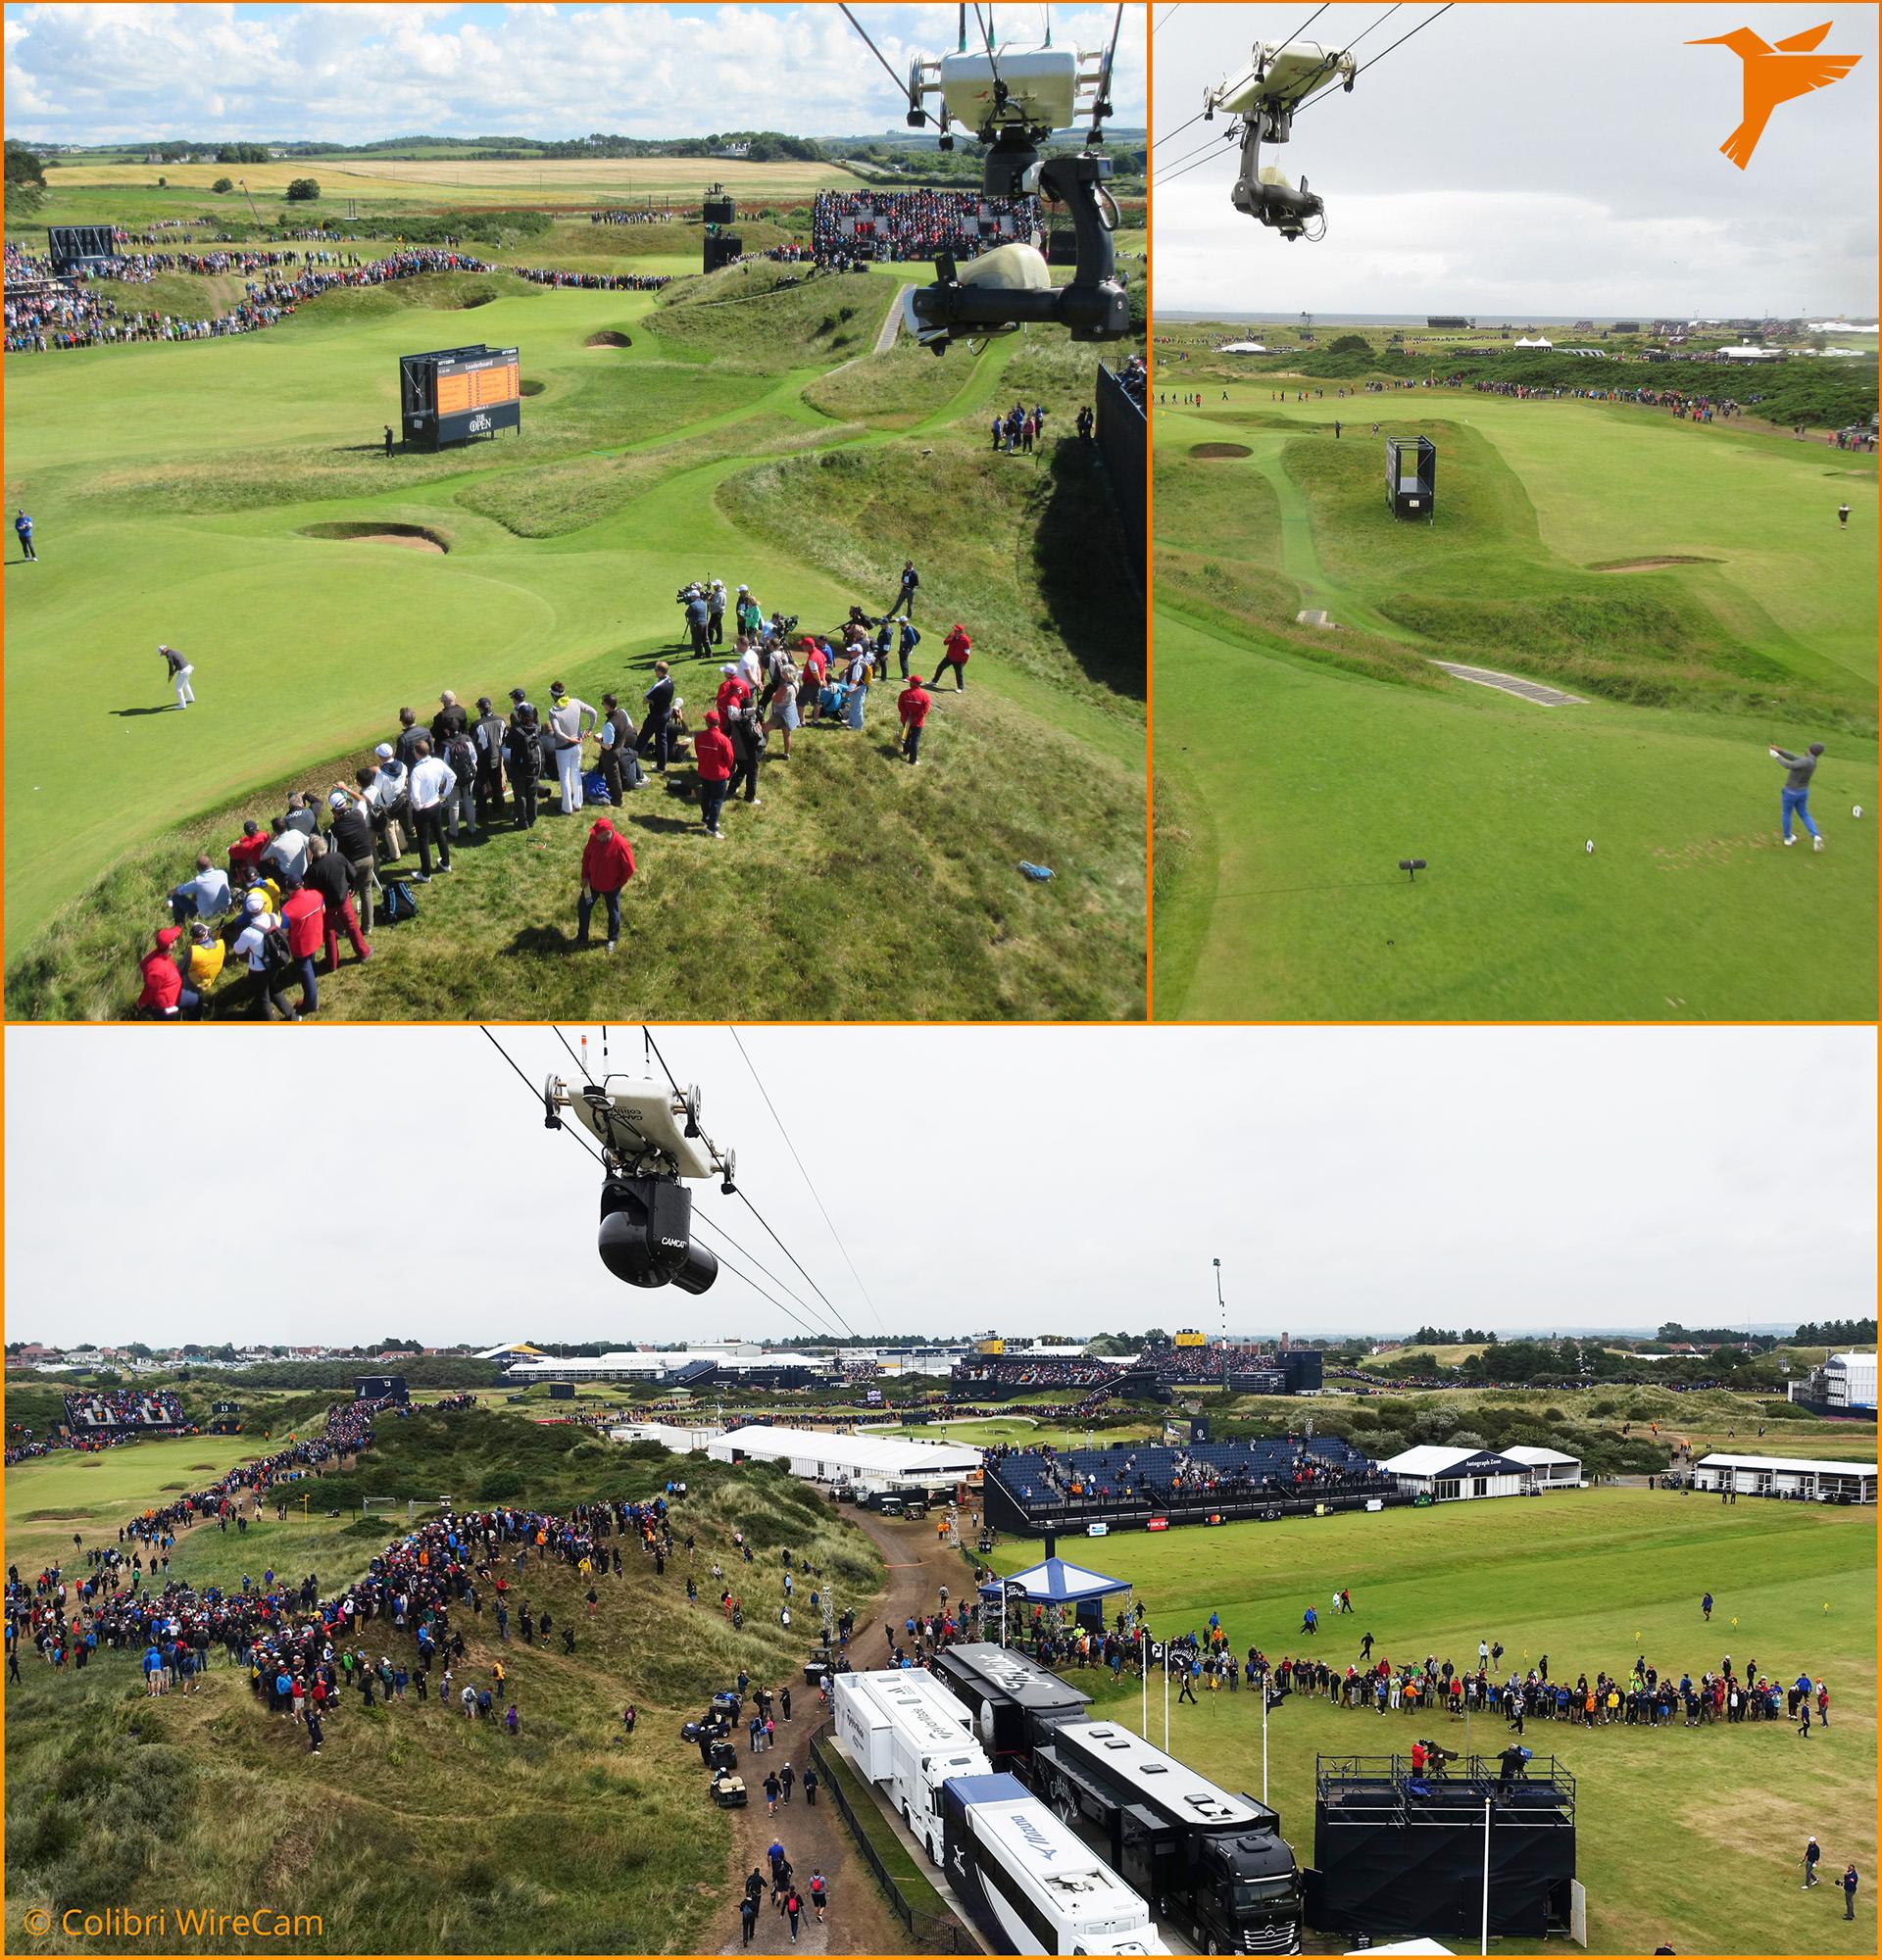 Golf, Golf Open, Troon, Birkdale, Colibri WireCam, cablecam, wirecam, flycam, Seilkamera, Kameraseilbahn